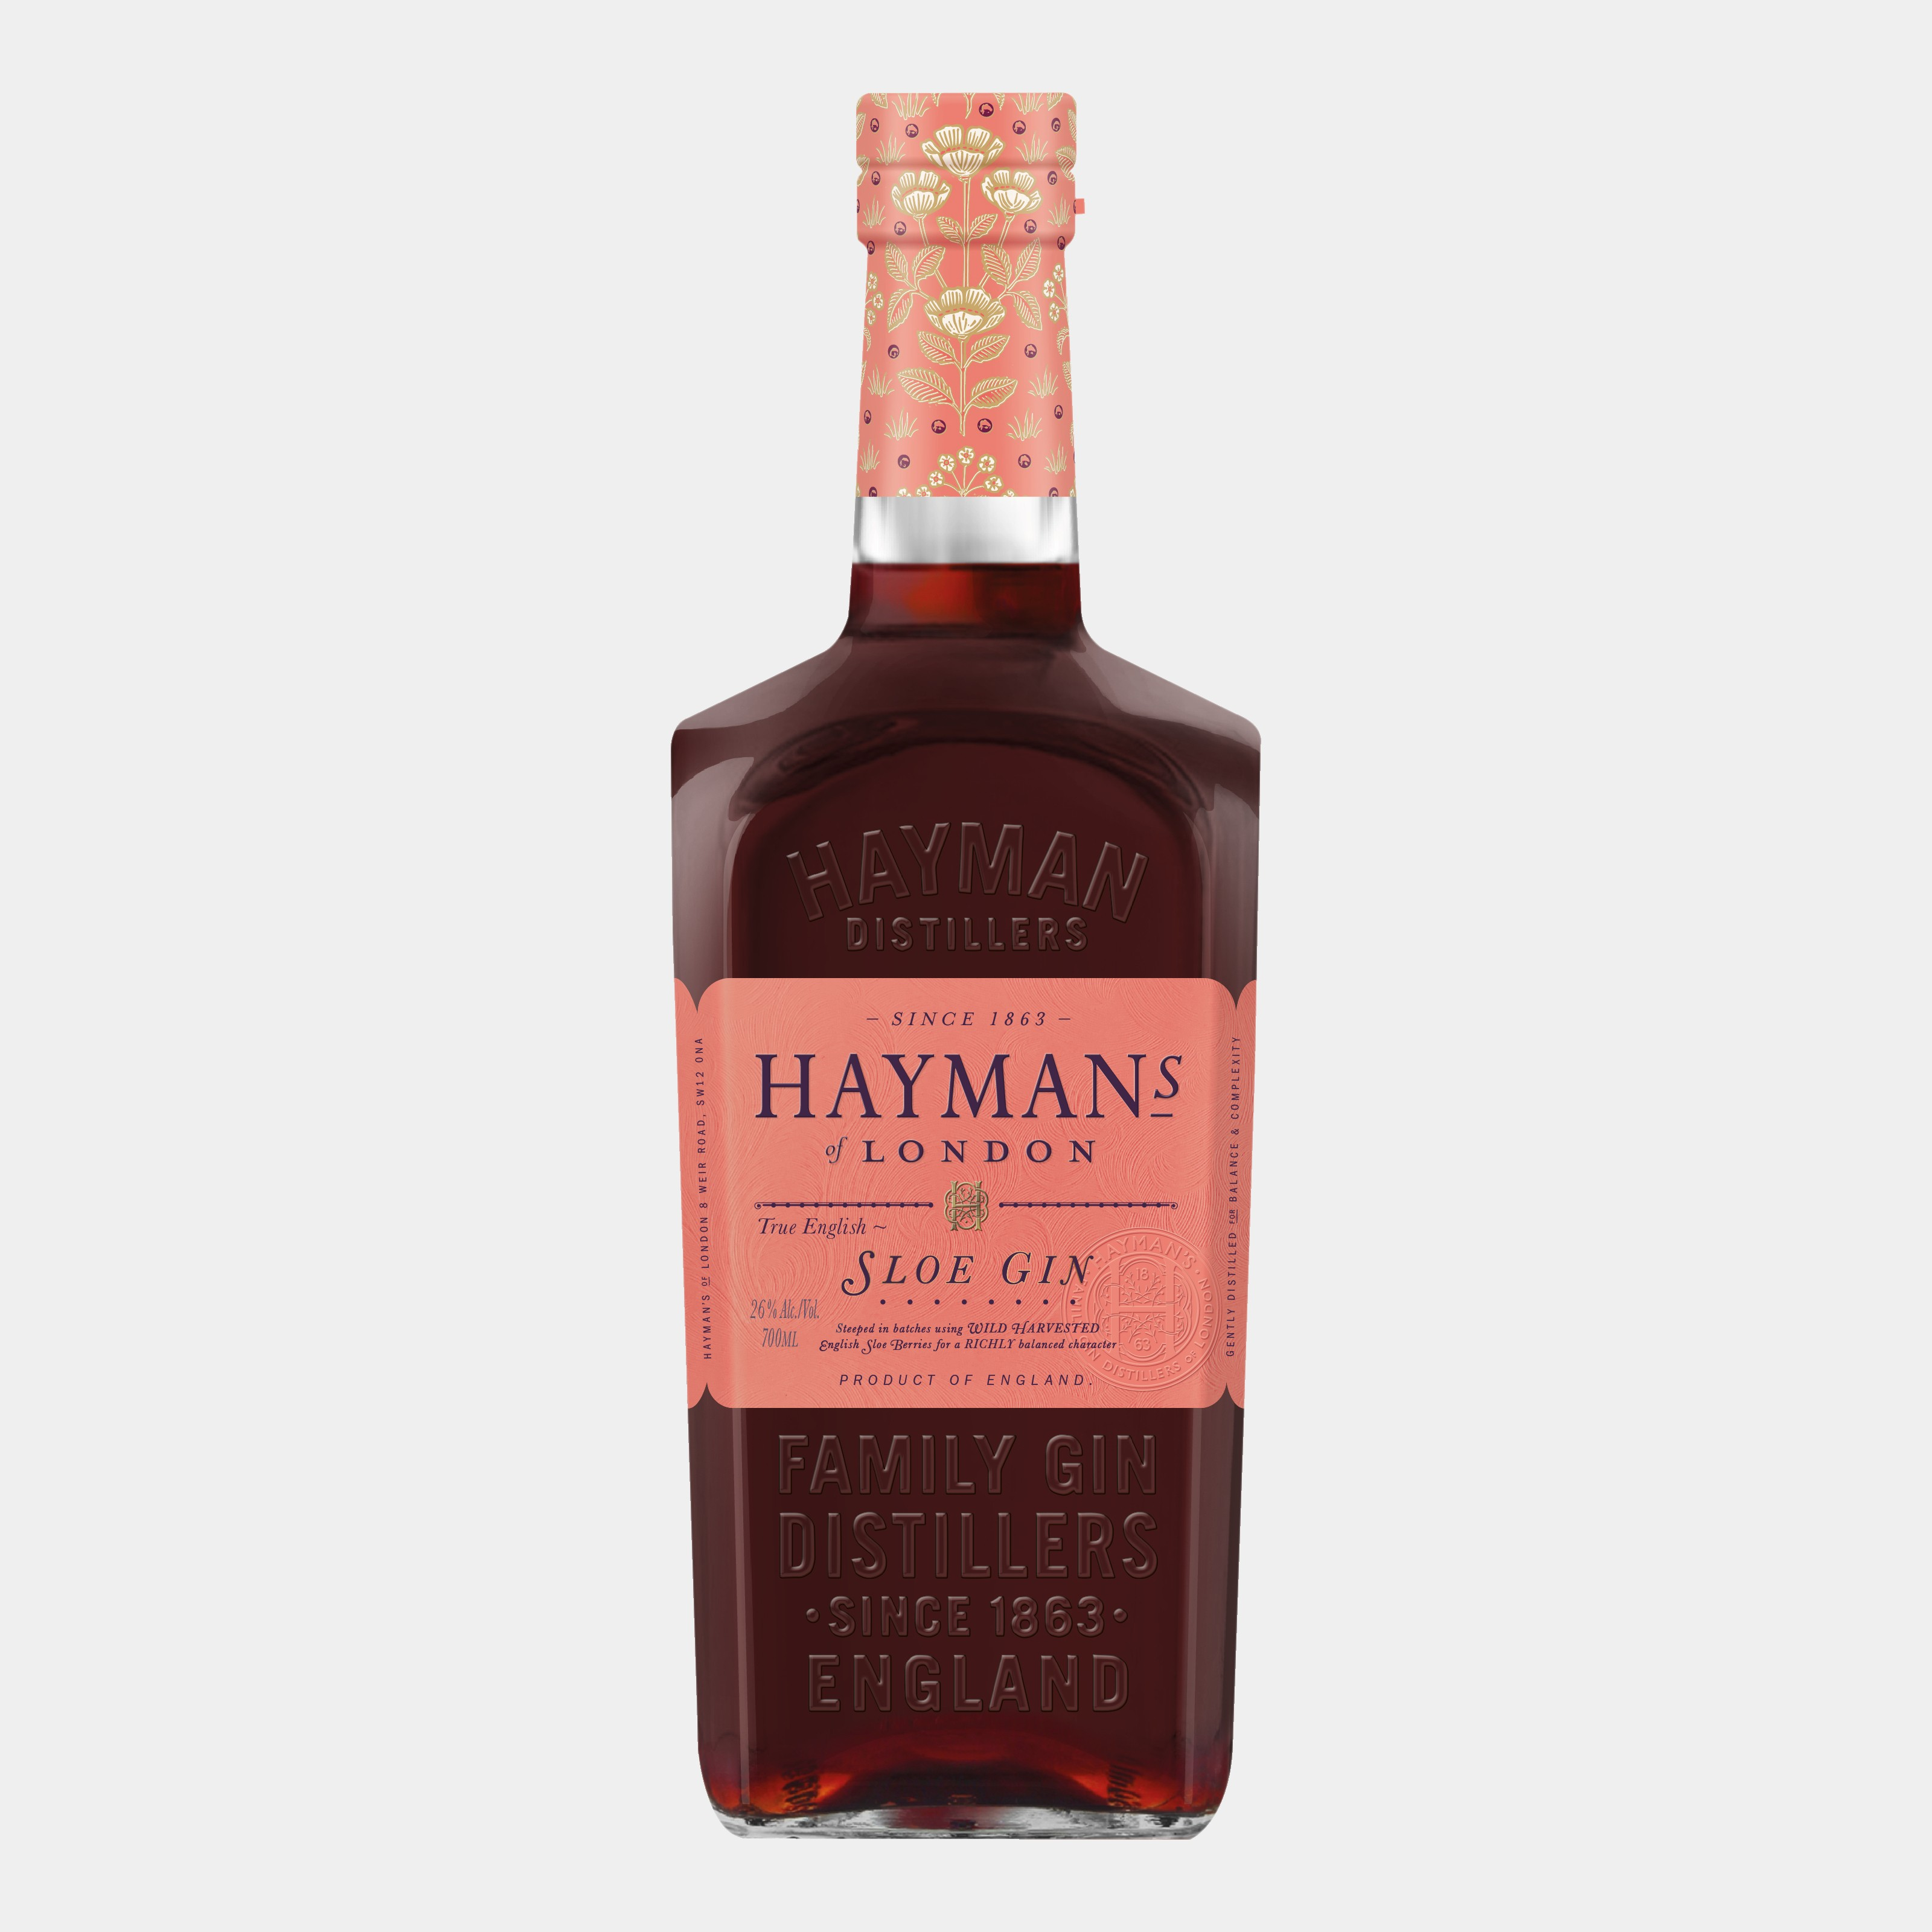 Hayman's Sloe Gin 0.7L 26% Alk.